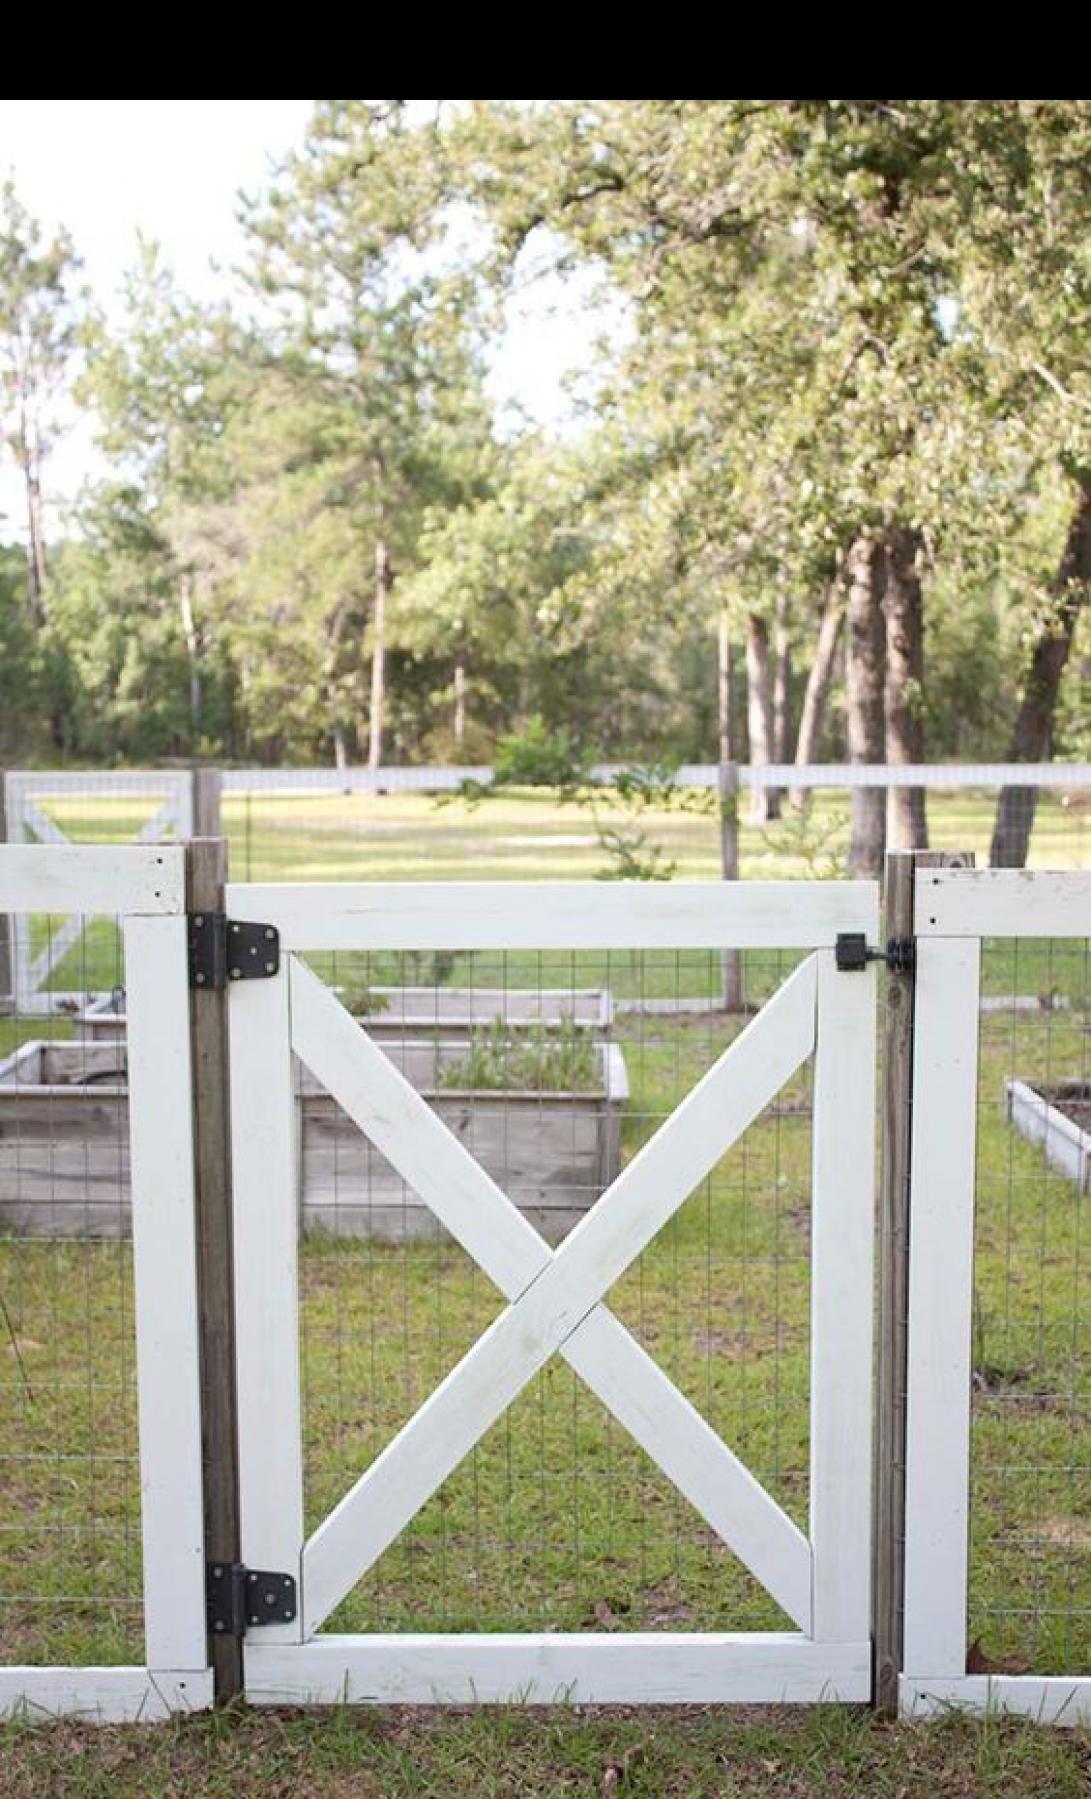 Farmhouse Style DIY Garden Fence - bingefashion.com/home,  #bingefashioncomhome #DIY #Farmhou... -  Farmhouse Style DIY Garden Fence – bingefashion.com/home,  #bingefashioncomhome #DIY #Farmhouse # - #bestgardenideas #bingefashion #bingefashioncomhome #DIY #diygardenbackyard #diygardendecorations #farmhou #farmhouse #fence #garden #gardensheddiy #style❤️ 🏩 🎭 🧊 ✨ 💛 #beauty #fashionstyle #scenery #architecturephotography #workout #fashiondesigner #Wedding